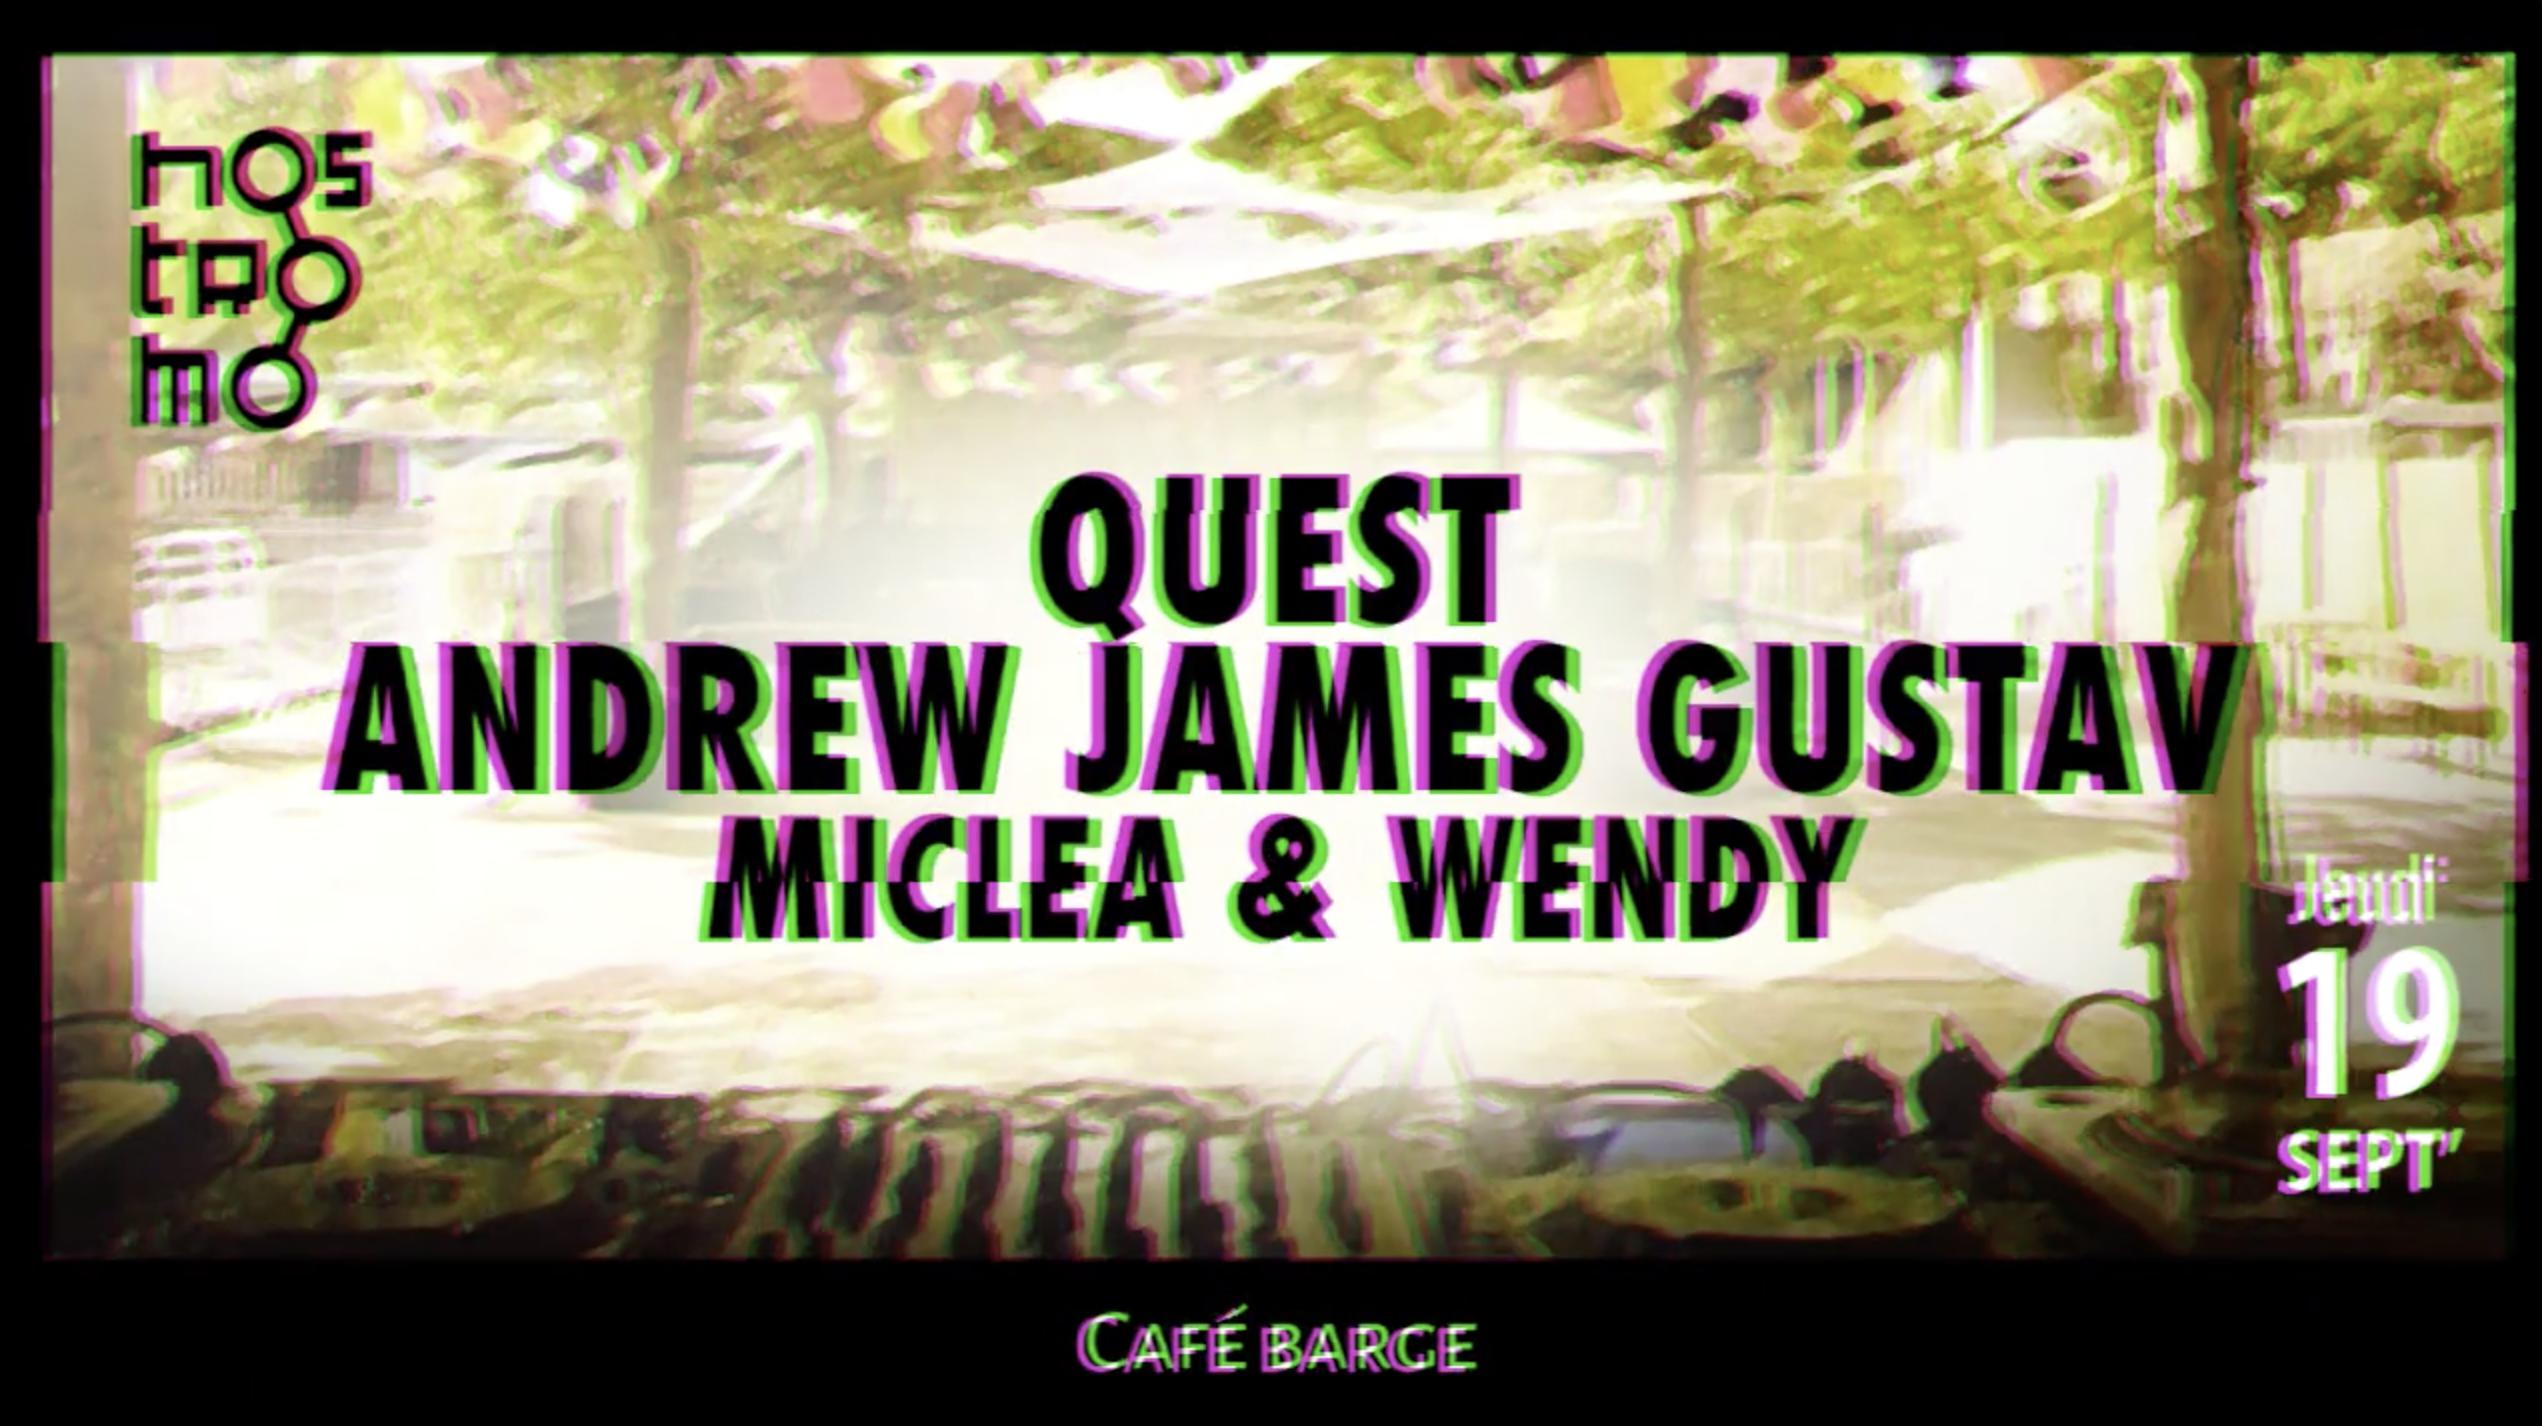 Les Barges x Nostromo : Quest & Andrew James Gustav • [OPEN AIR]